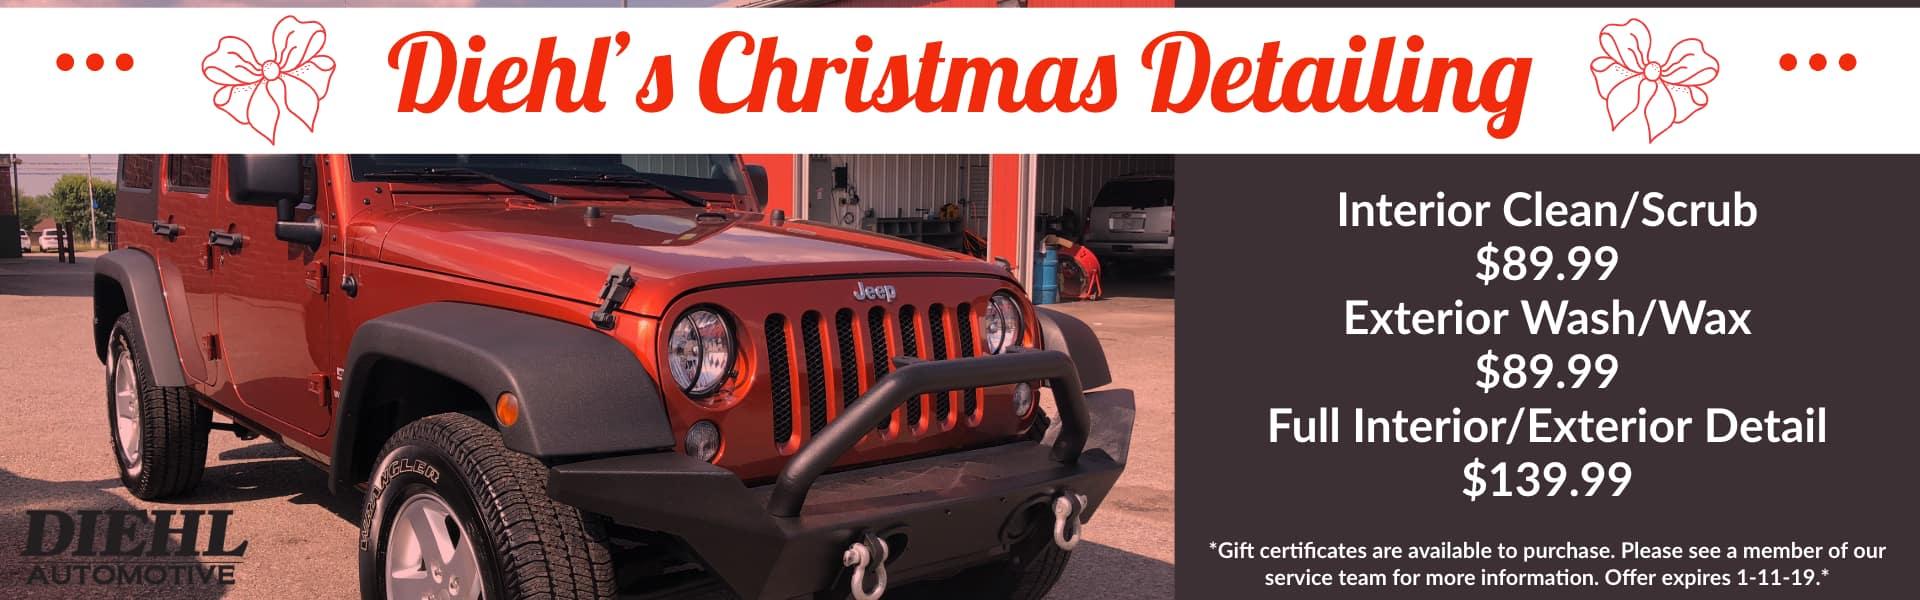 diehl christmas detailing diehl automotive car detail interior detail exterior detail cleaning wax shine vehicle service vehicle care salem ohio